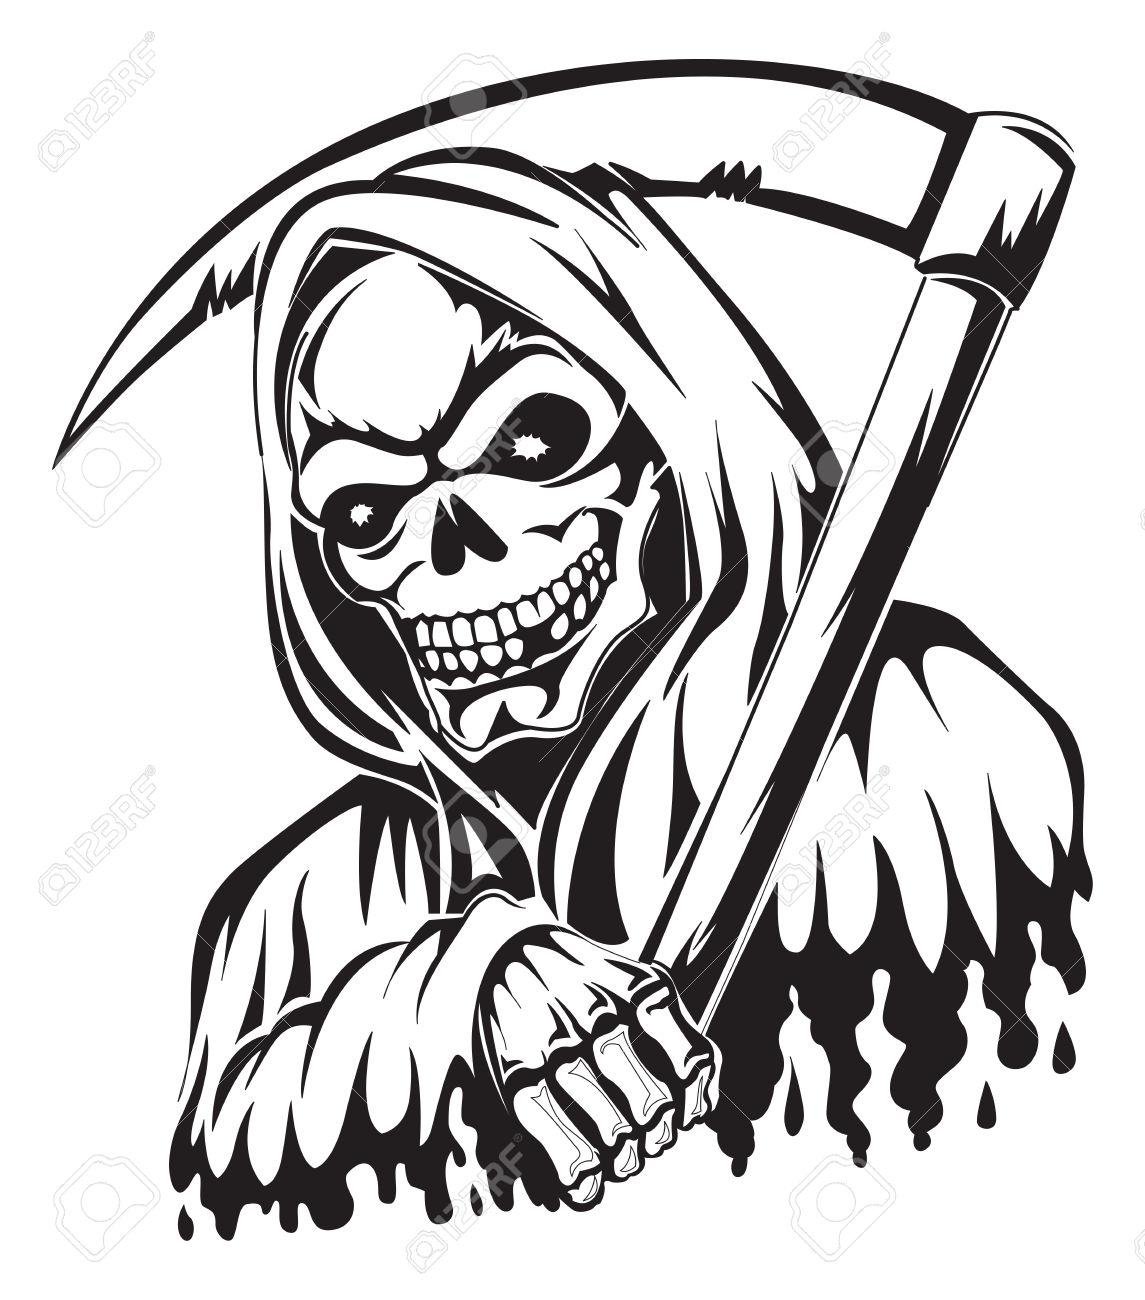 clipart freeuse download Gram x free clip. Grim reaper clipart grm